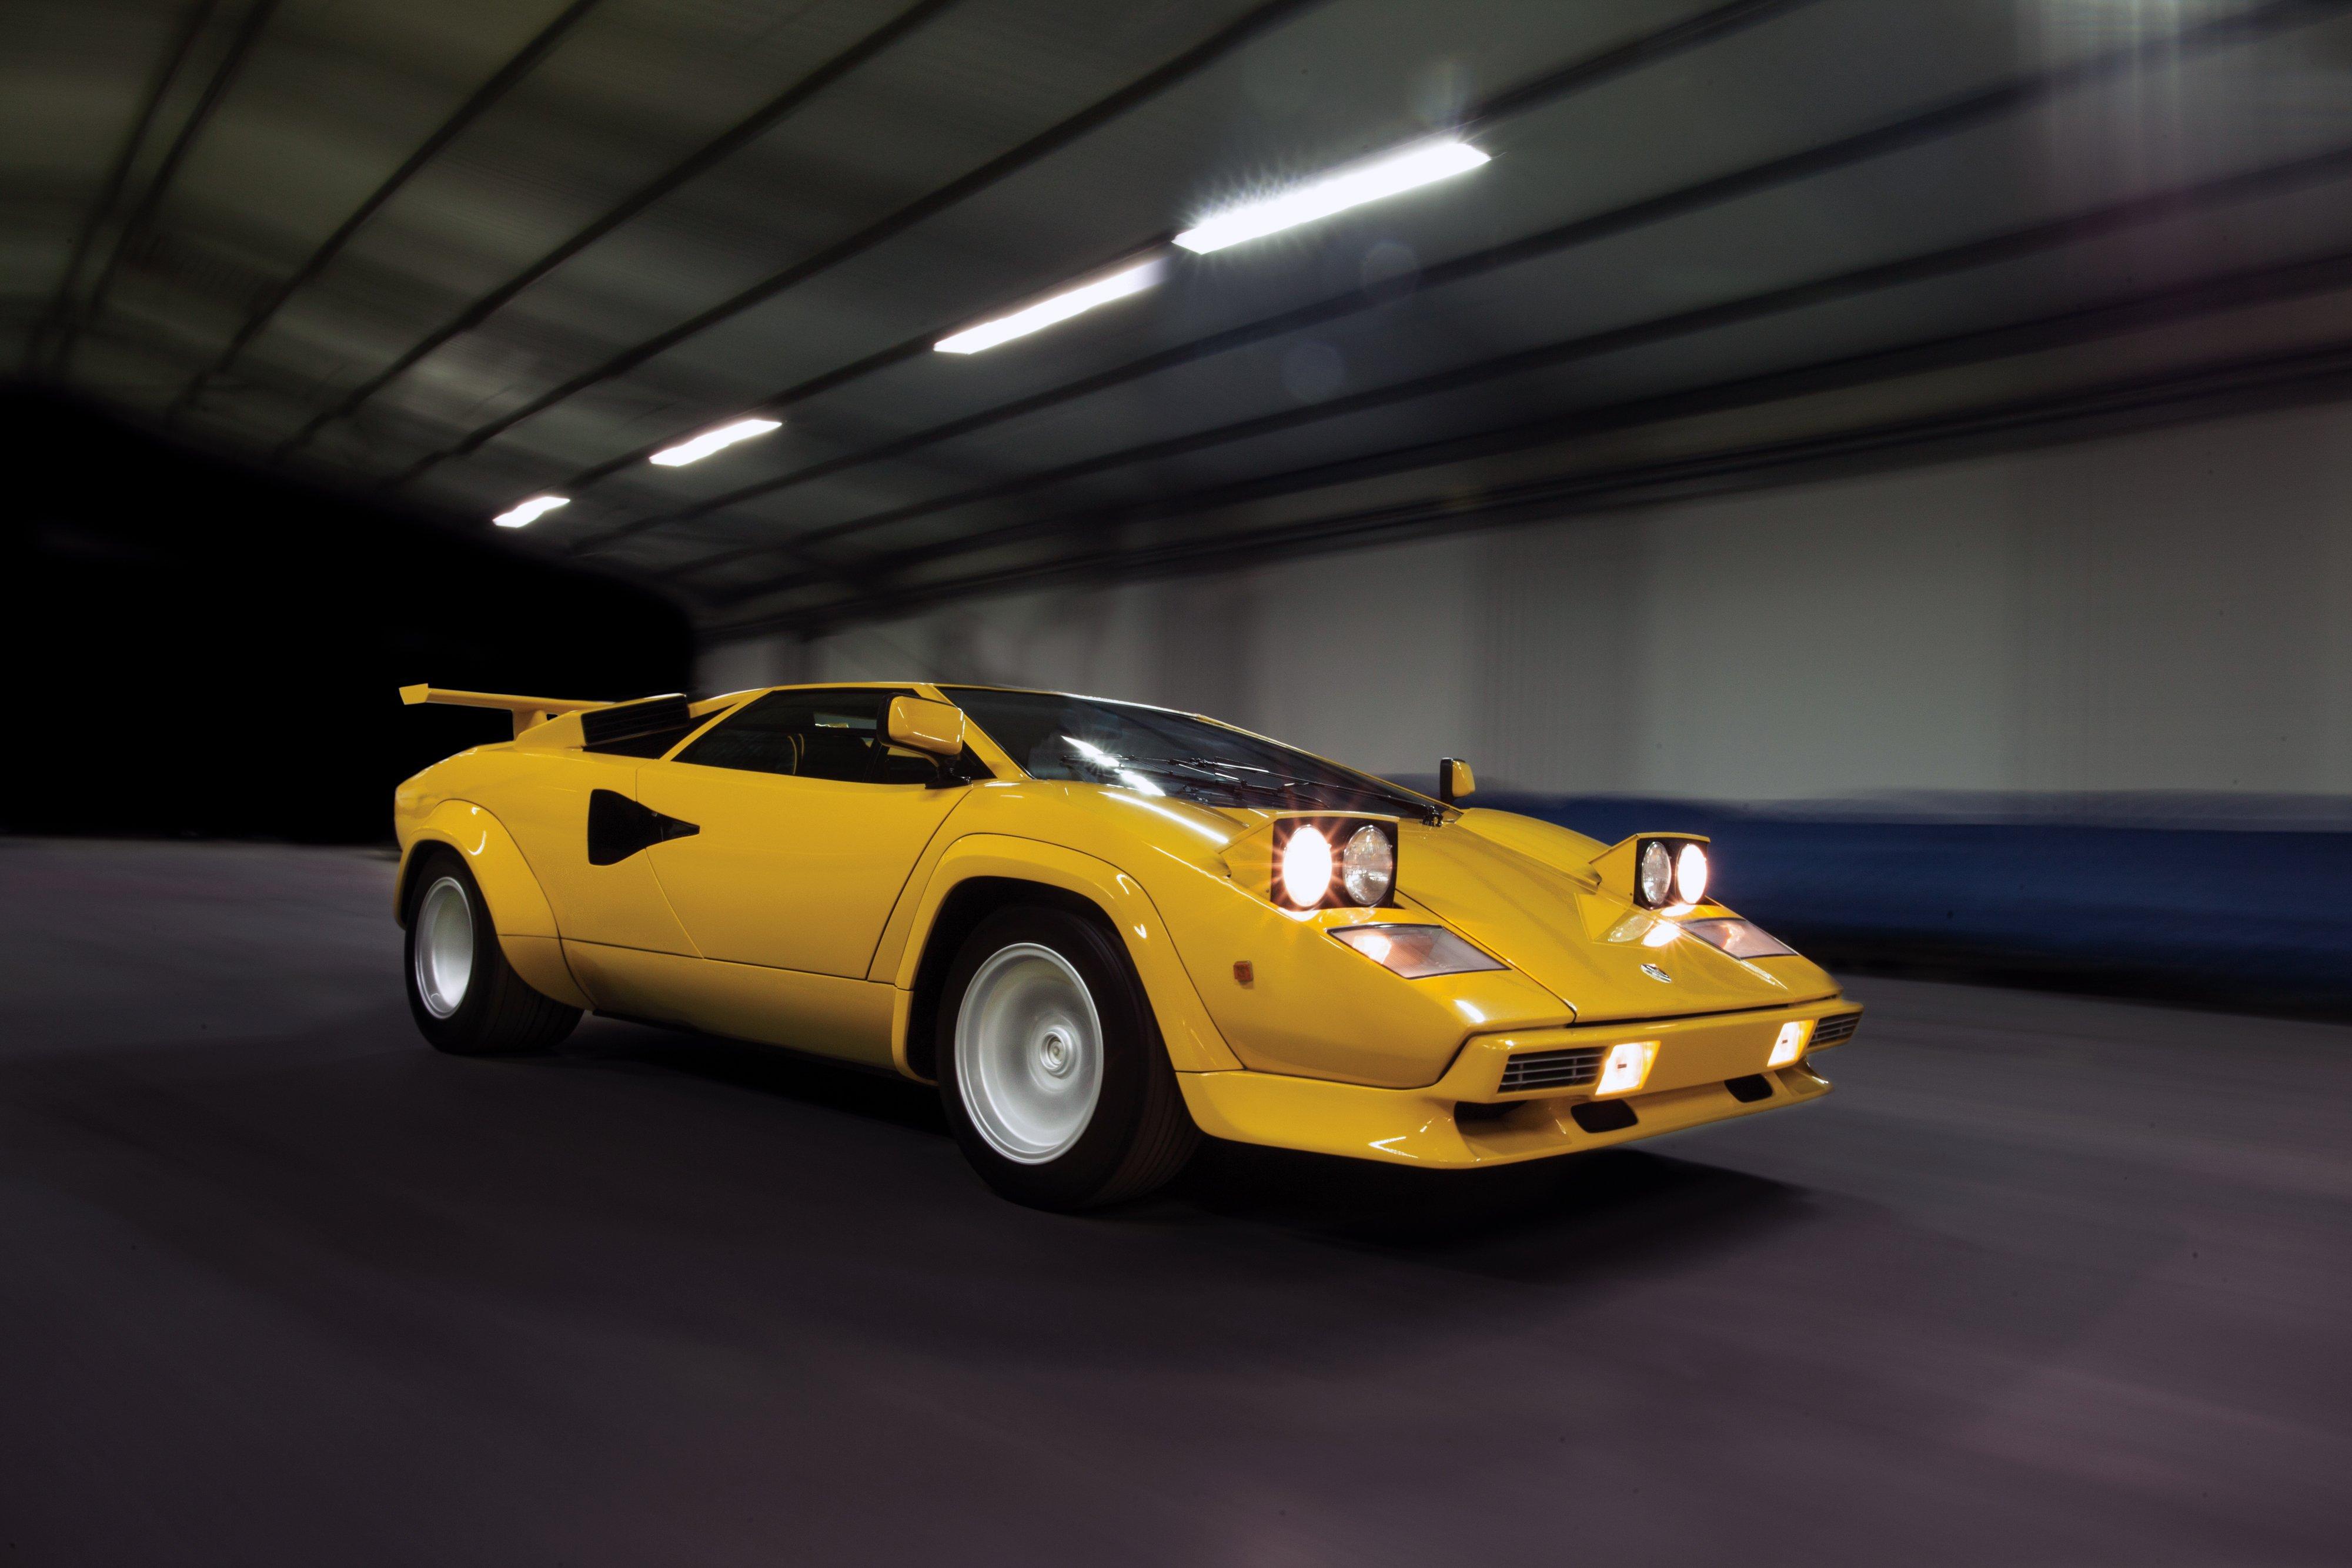 Lamborghini Countach Lp400 S Cars Supercars 1981 Wallpaper 4000x2667 838772 Wallpaperup